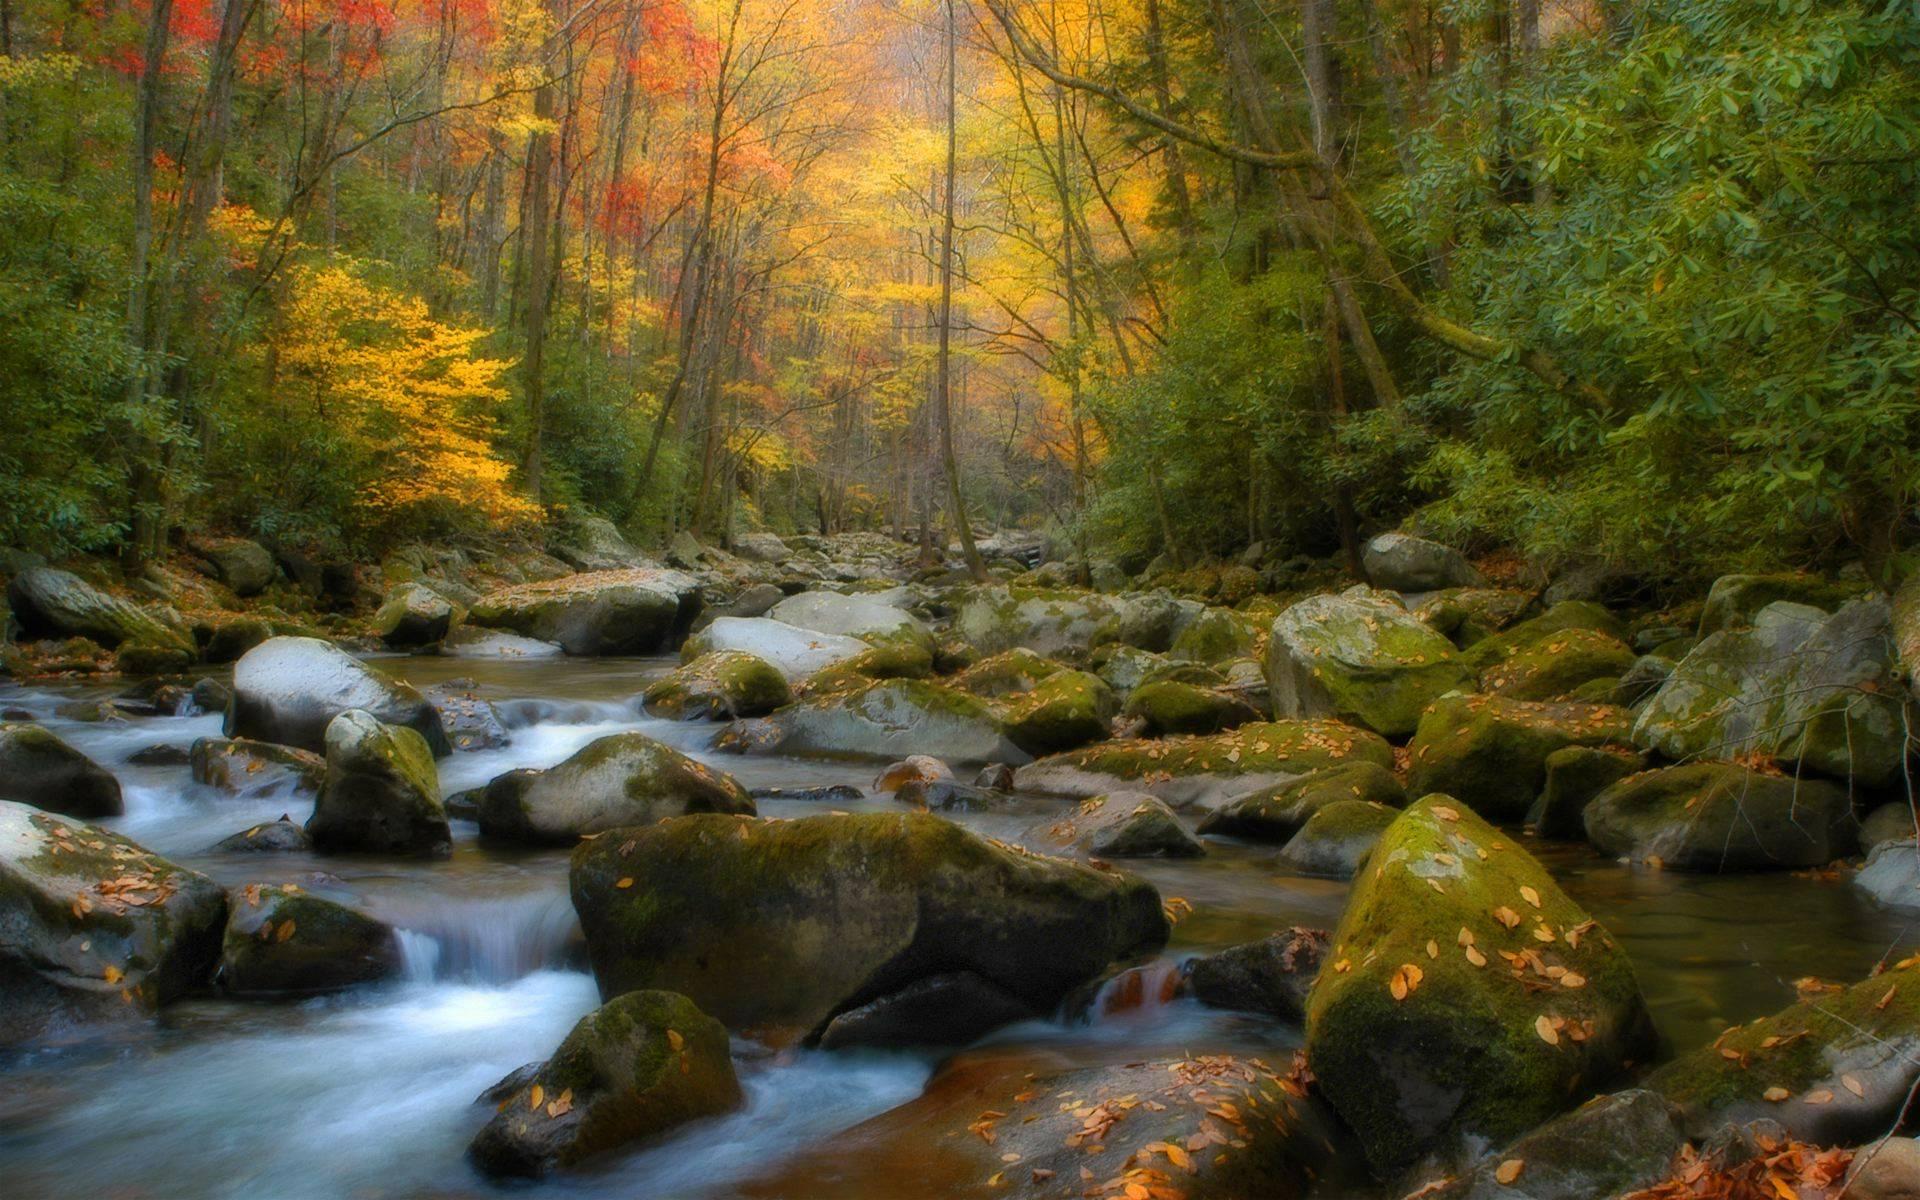 HD wallpaper Screensaver Screensavers Natural Background Nature by 1920x1200